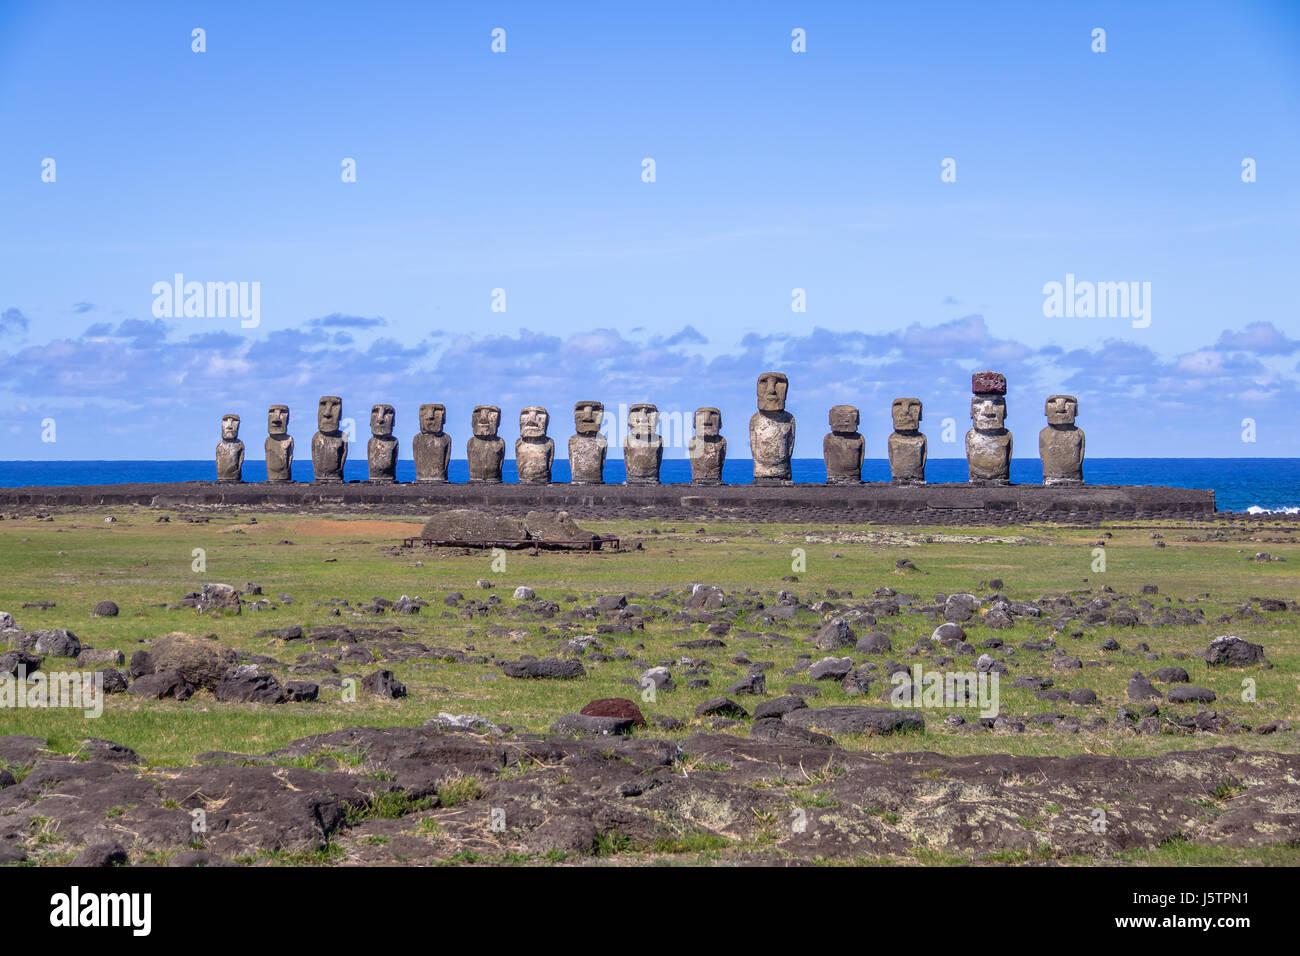 Moai Statue di Ahu Tongariki - Isola di Pasqua, Cile Immagini Stock